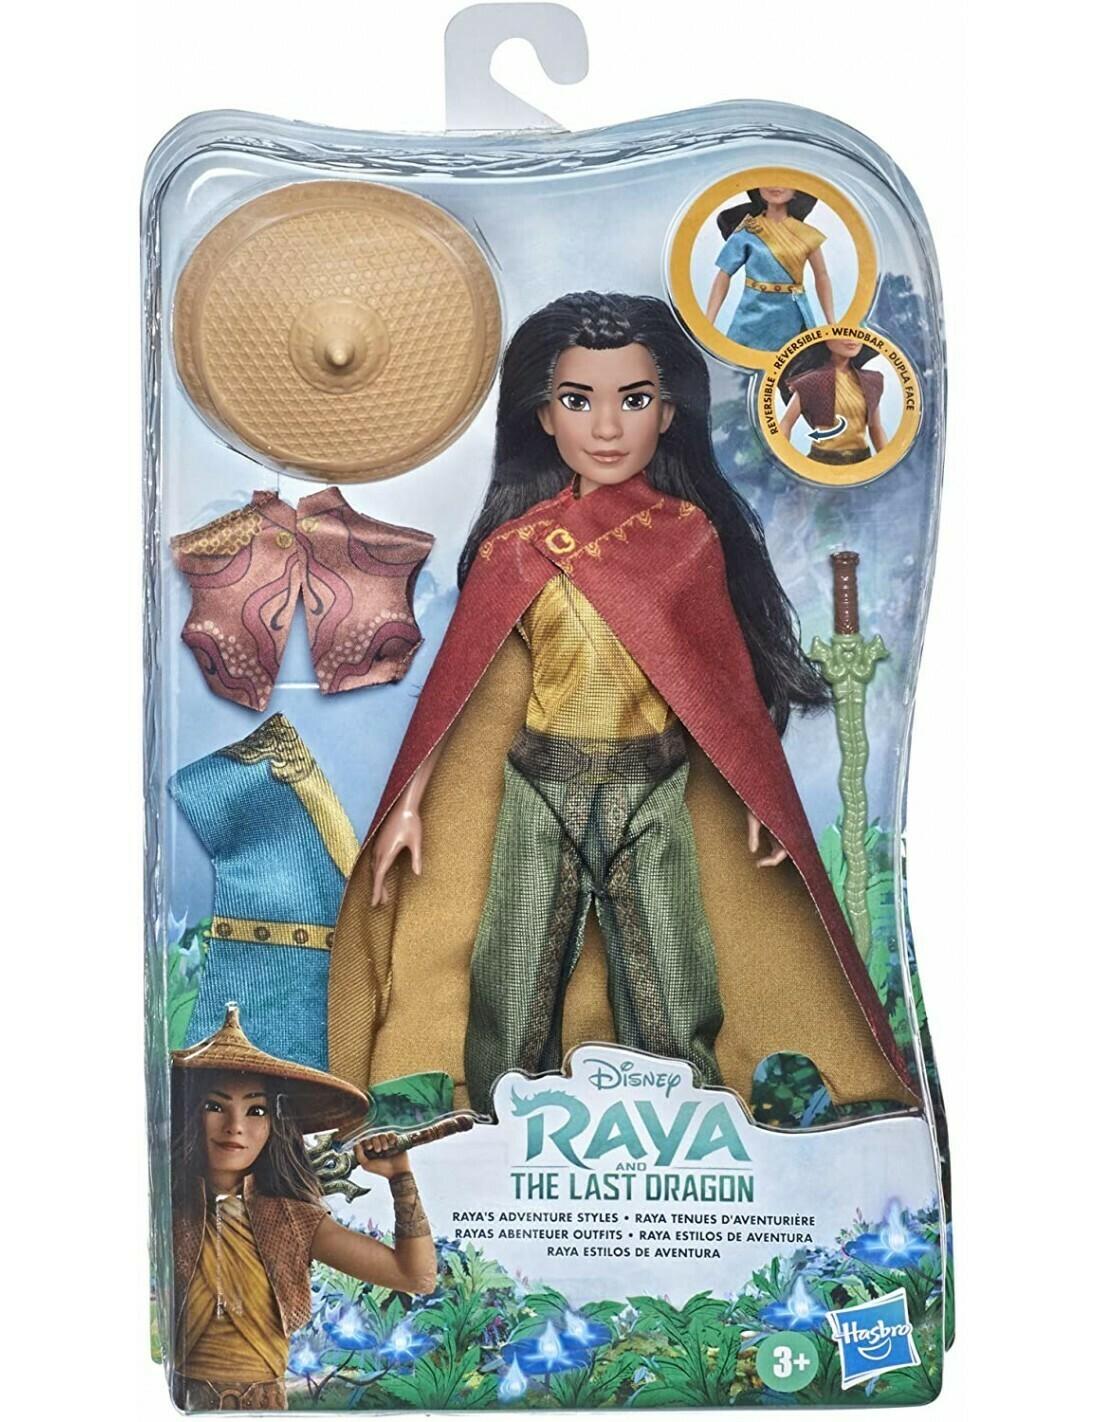 Raya poupée coiffure set